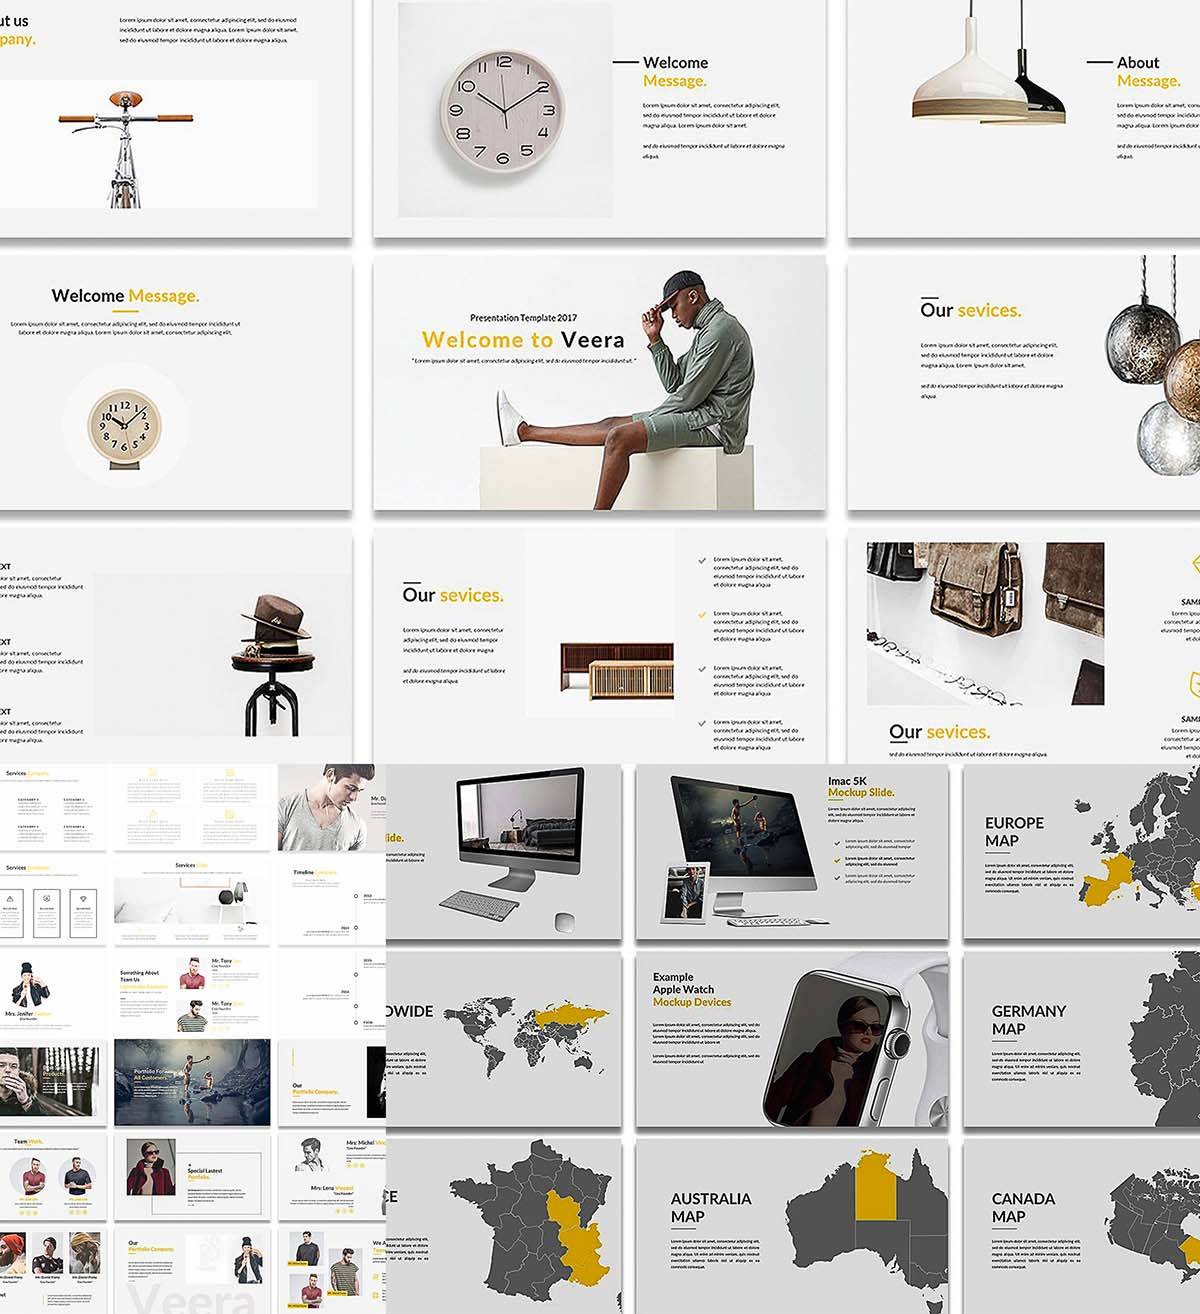 Veera PowerPoint presentation